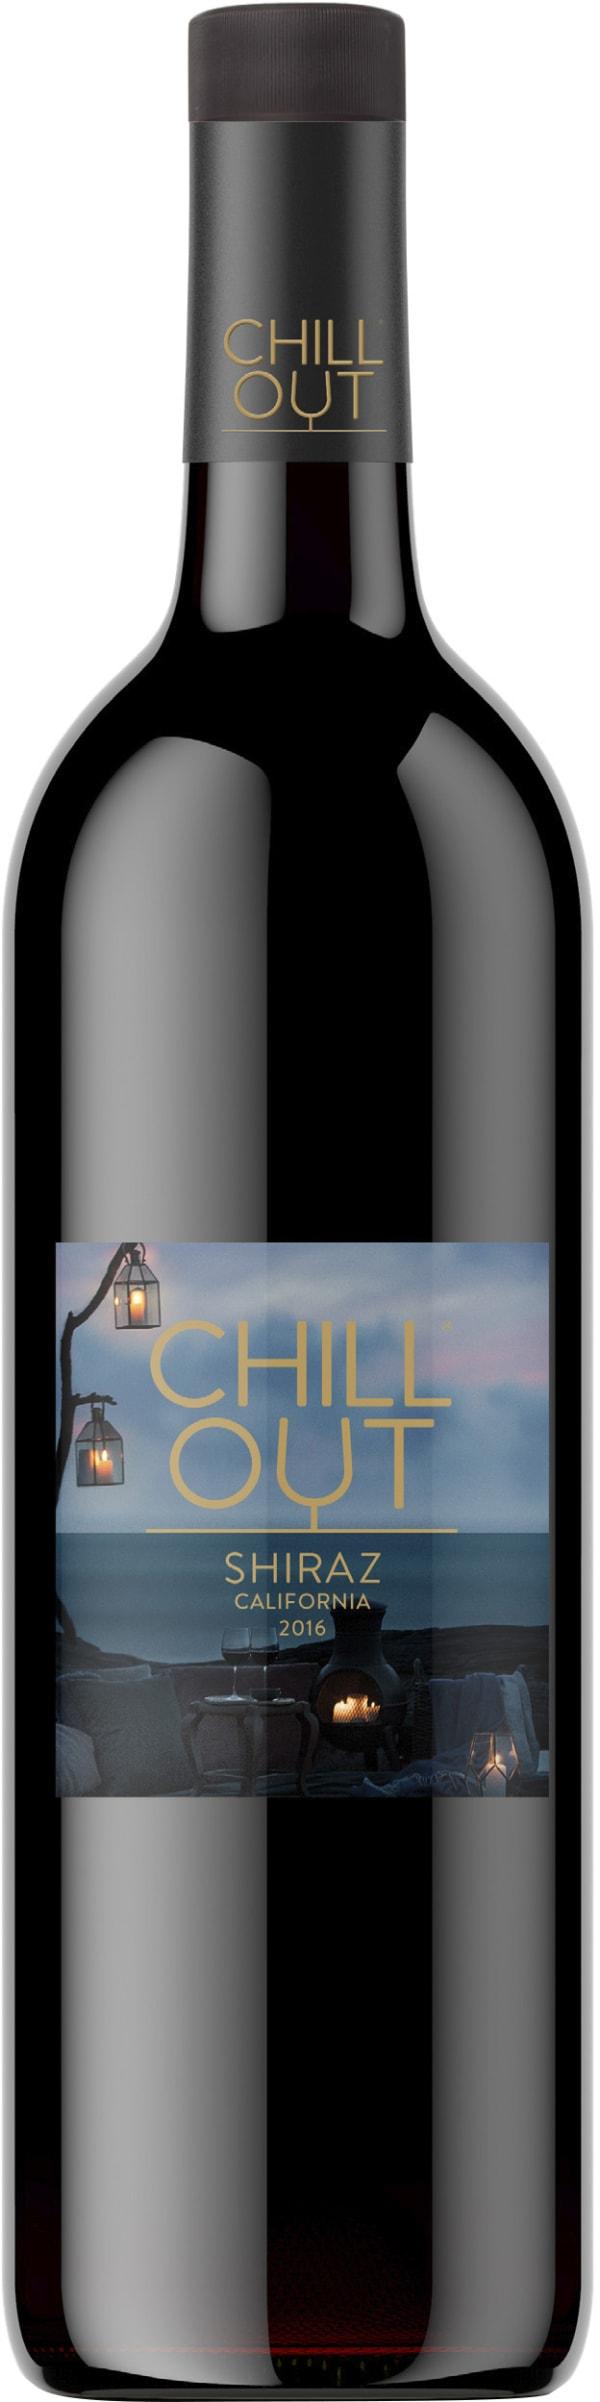 Chill Out Dark & Generous Shiraz 2015 plastflaska